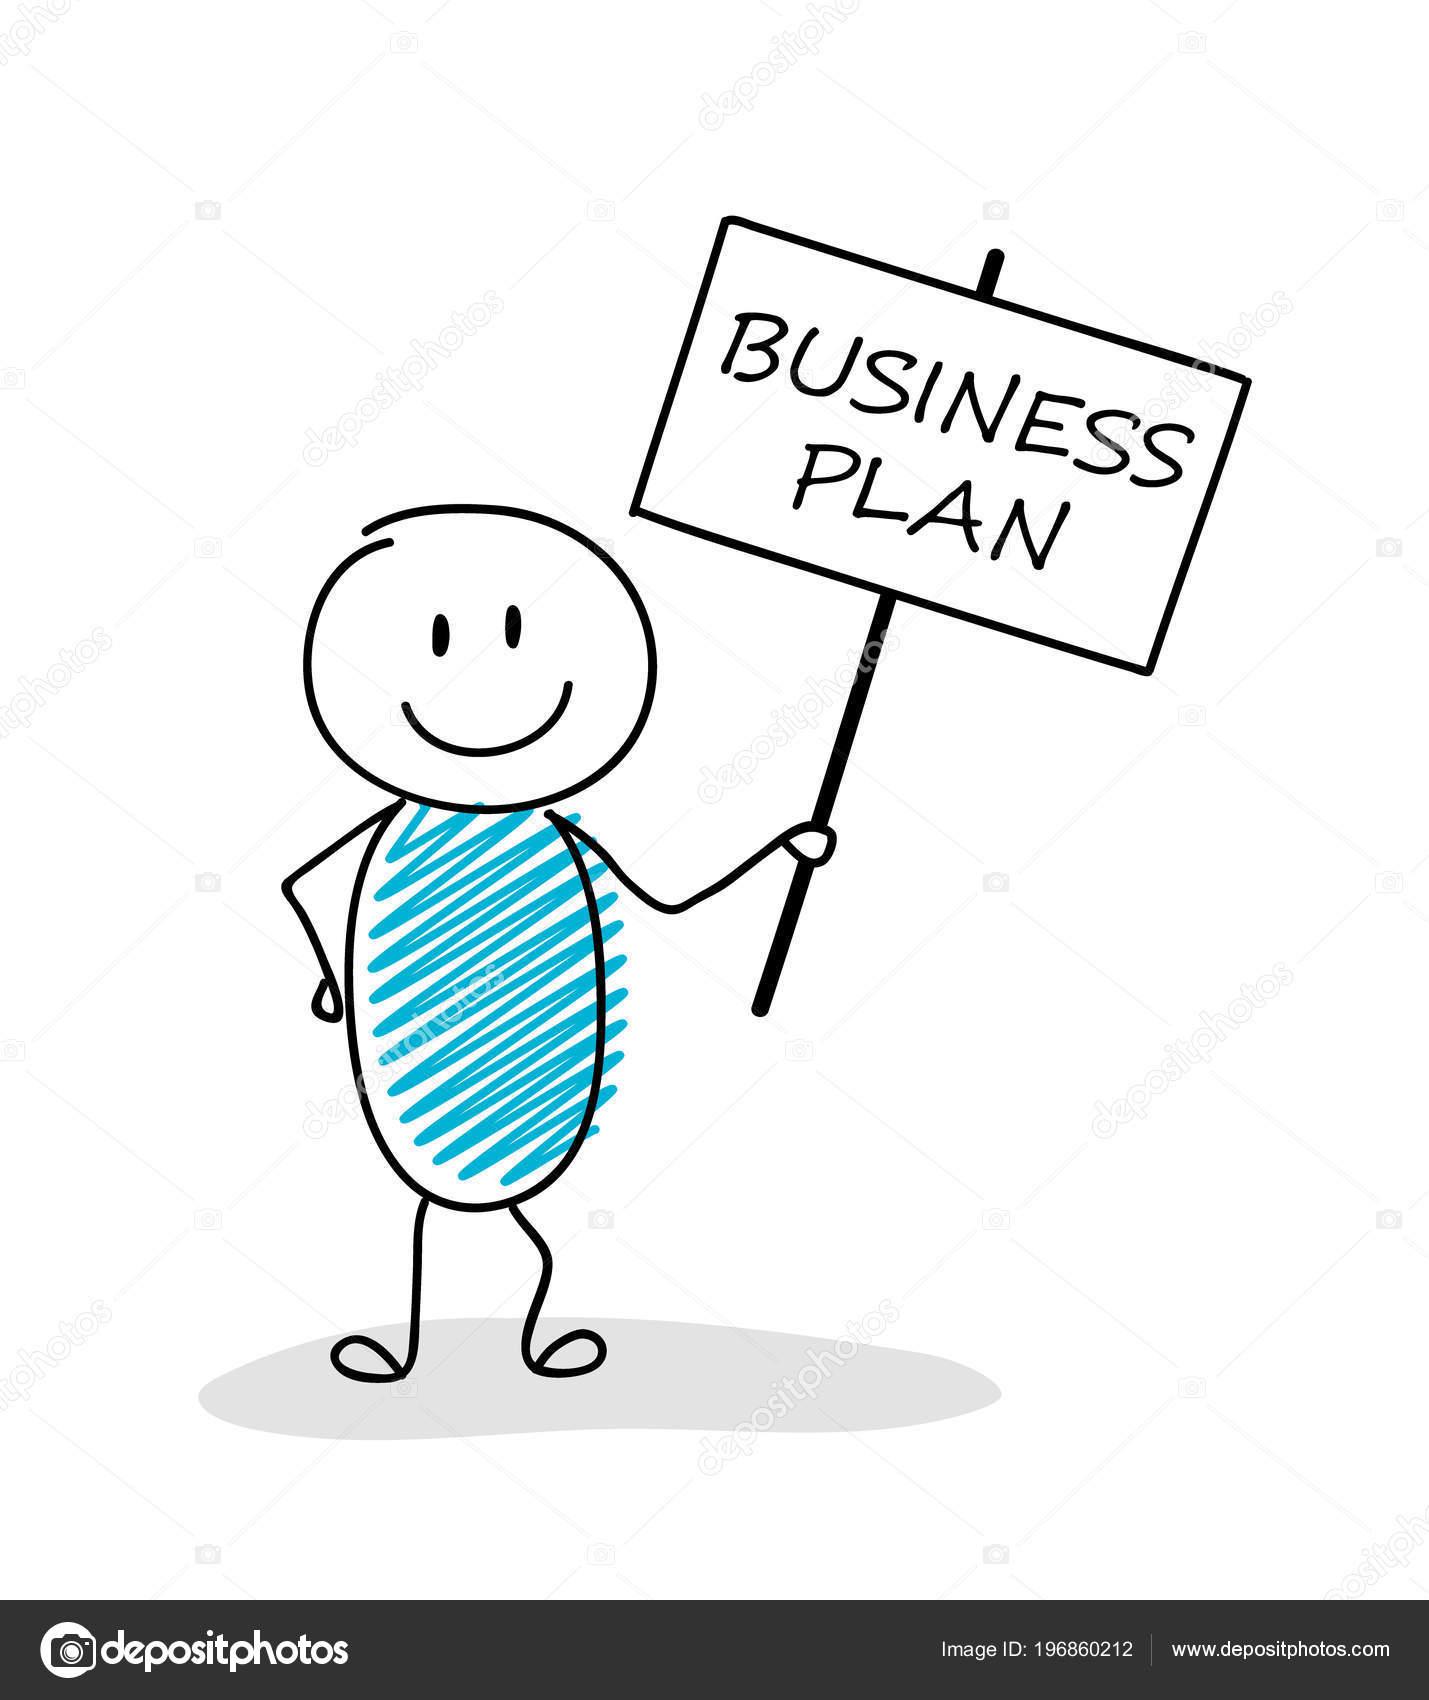 Funny Business Illustration Cartoon Stickman Holding Banner Slogan Business Plan